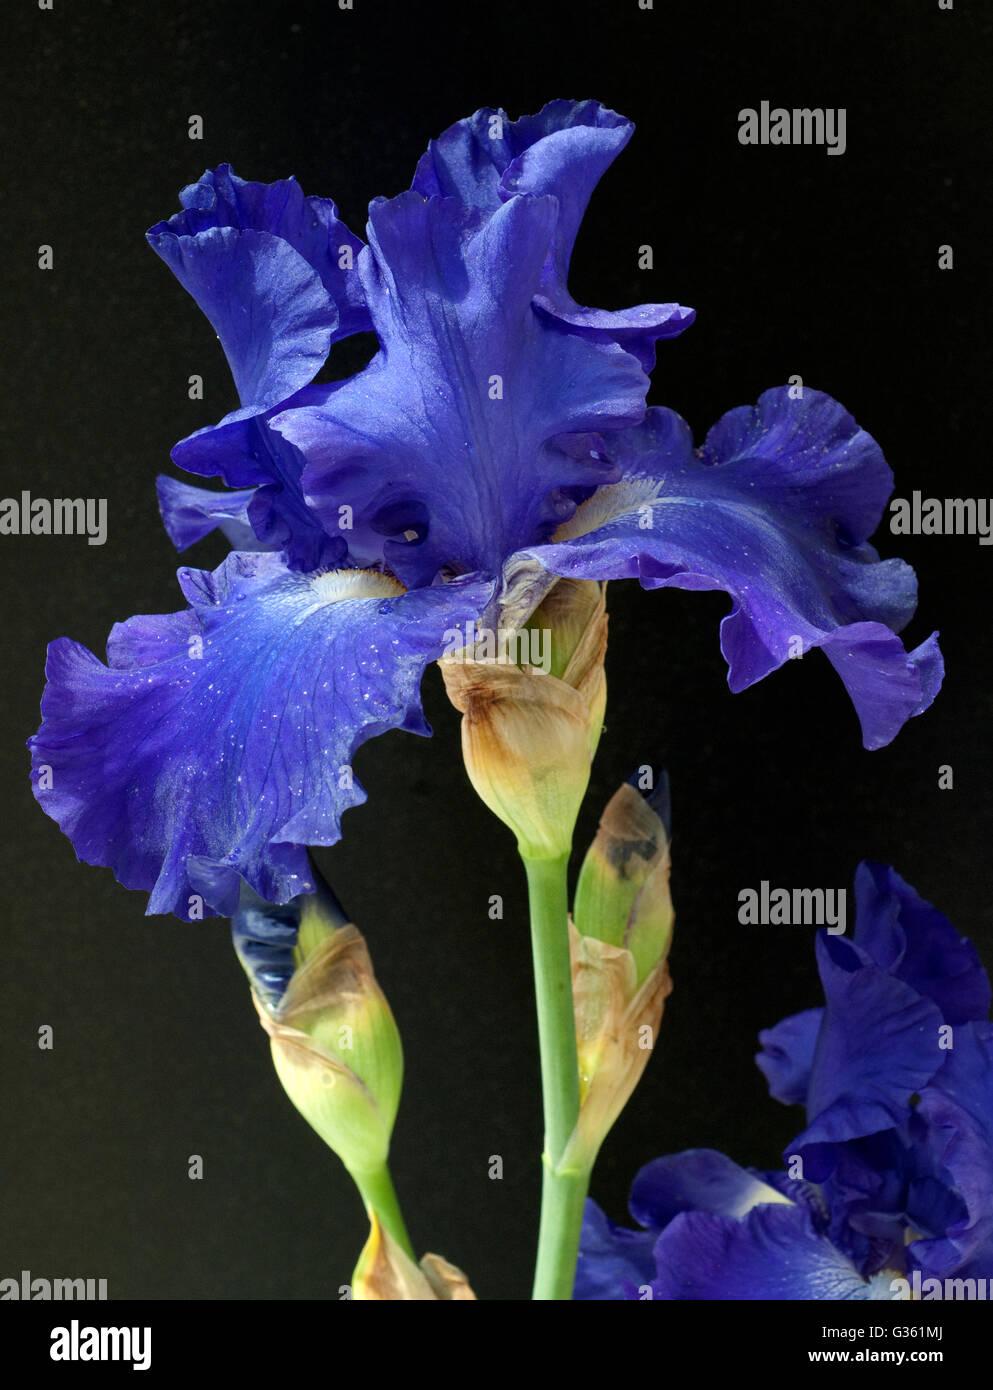 Schwertlilie, Iris Barbata-Elatior, Blue Rhythm, Hohe Bart-Iris - Stock Image